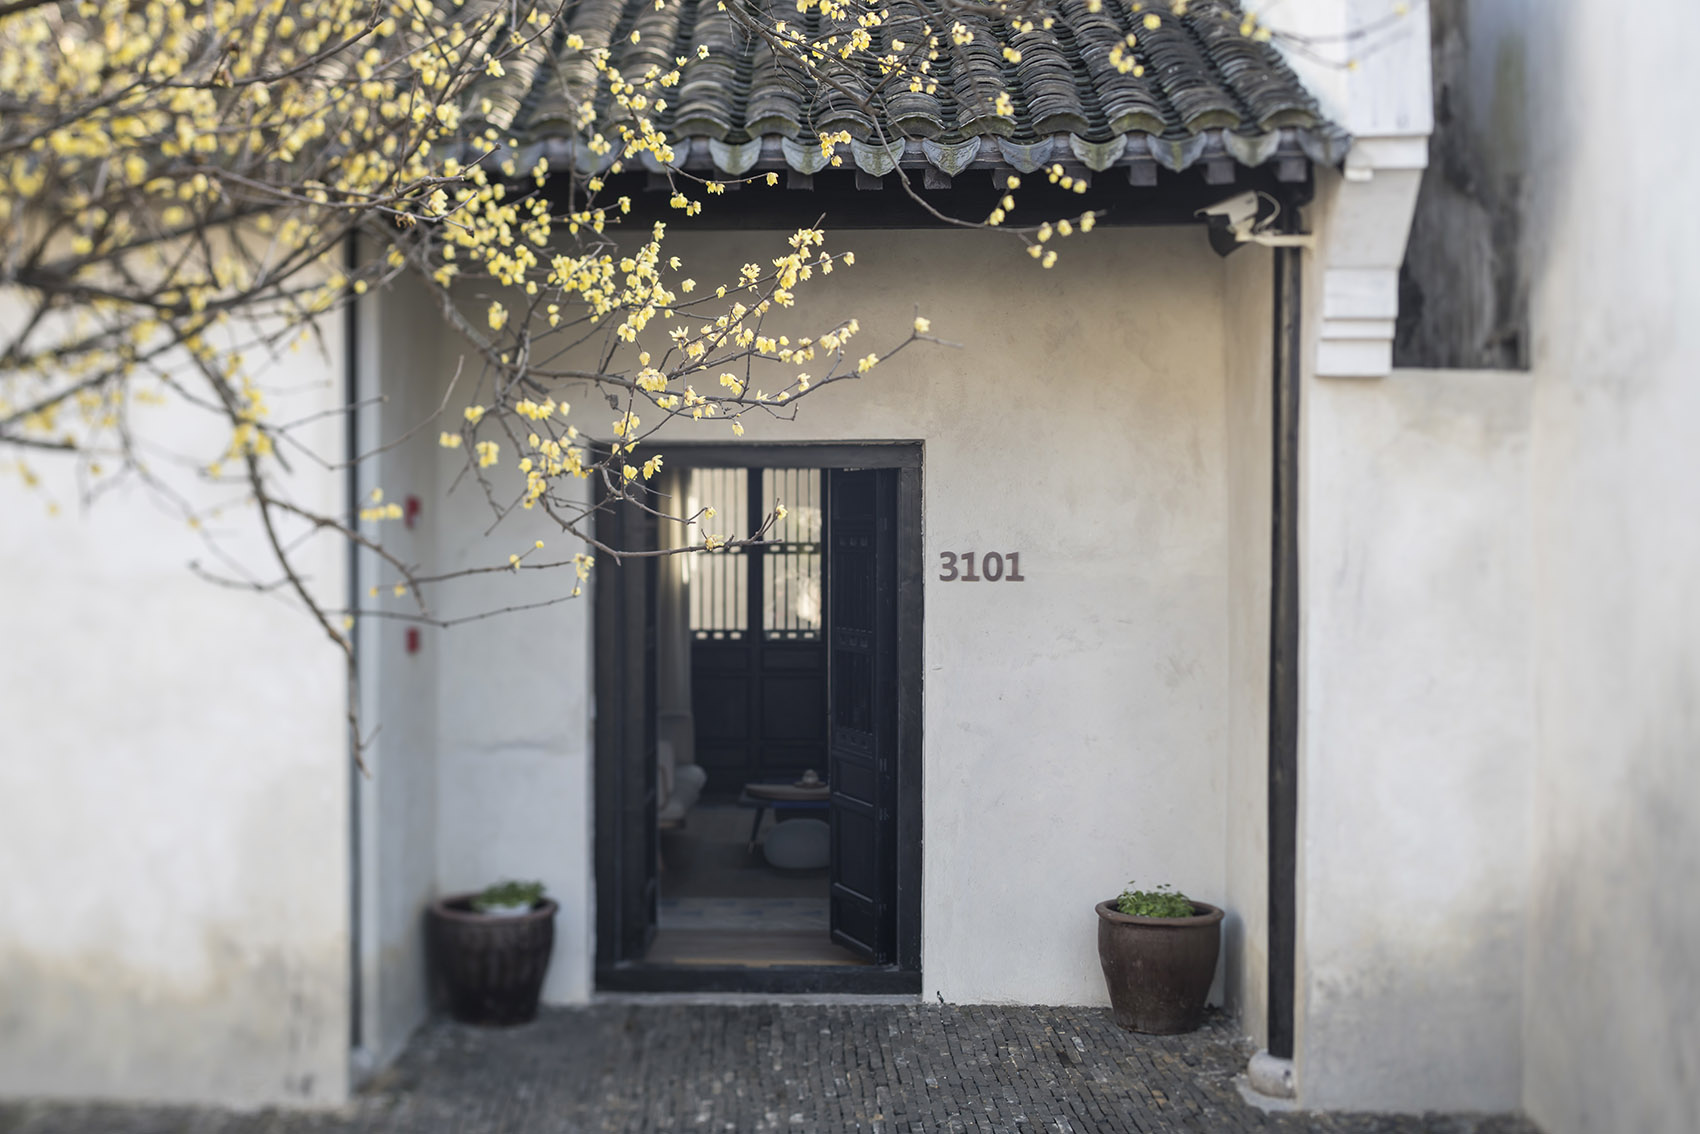 012-Nanxun-Blossom-Hill-Boutique-Hotel-Qiu-Shu-Li-By-Dariel-Studio